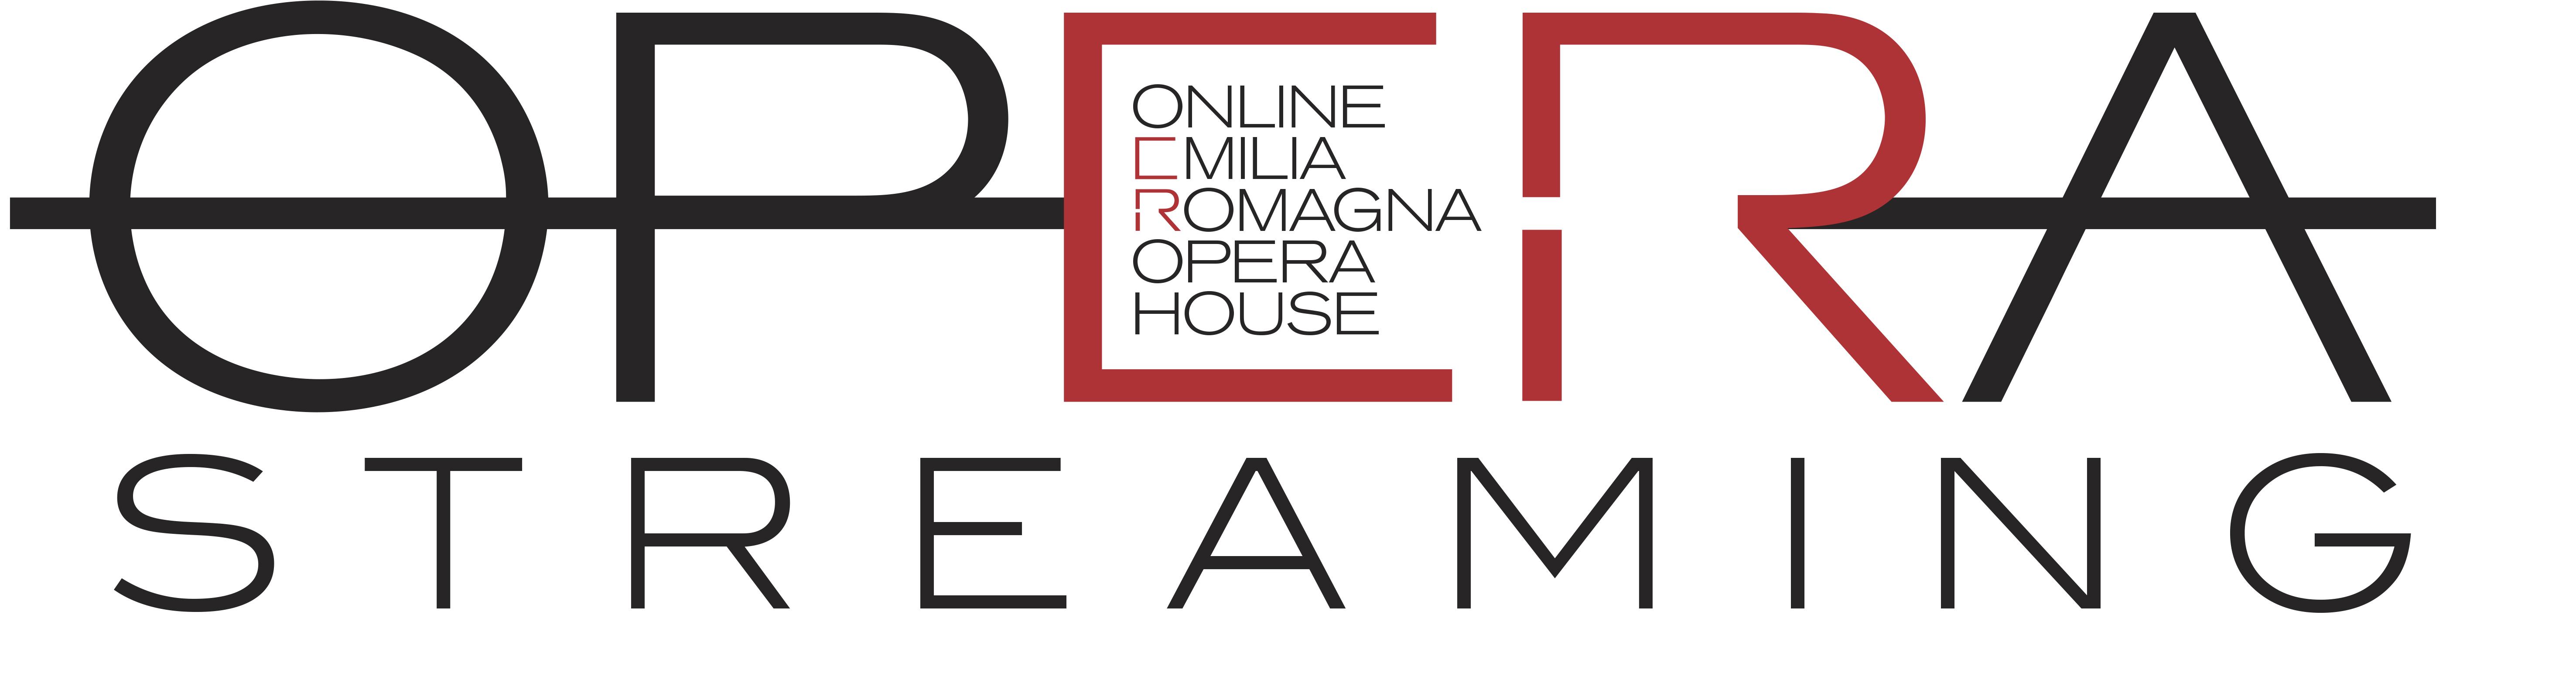 câștigă bani opera online